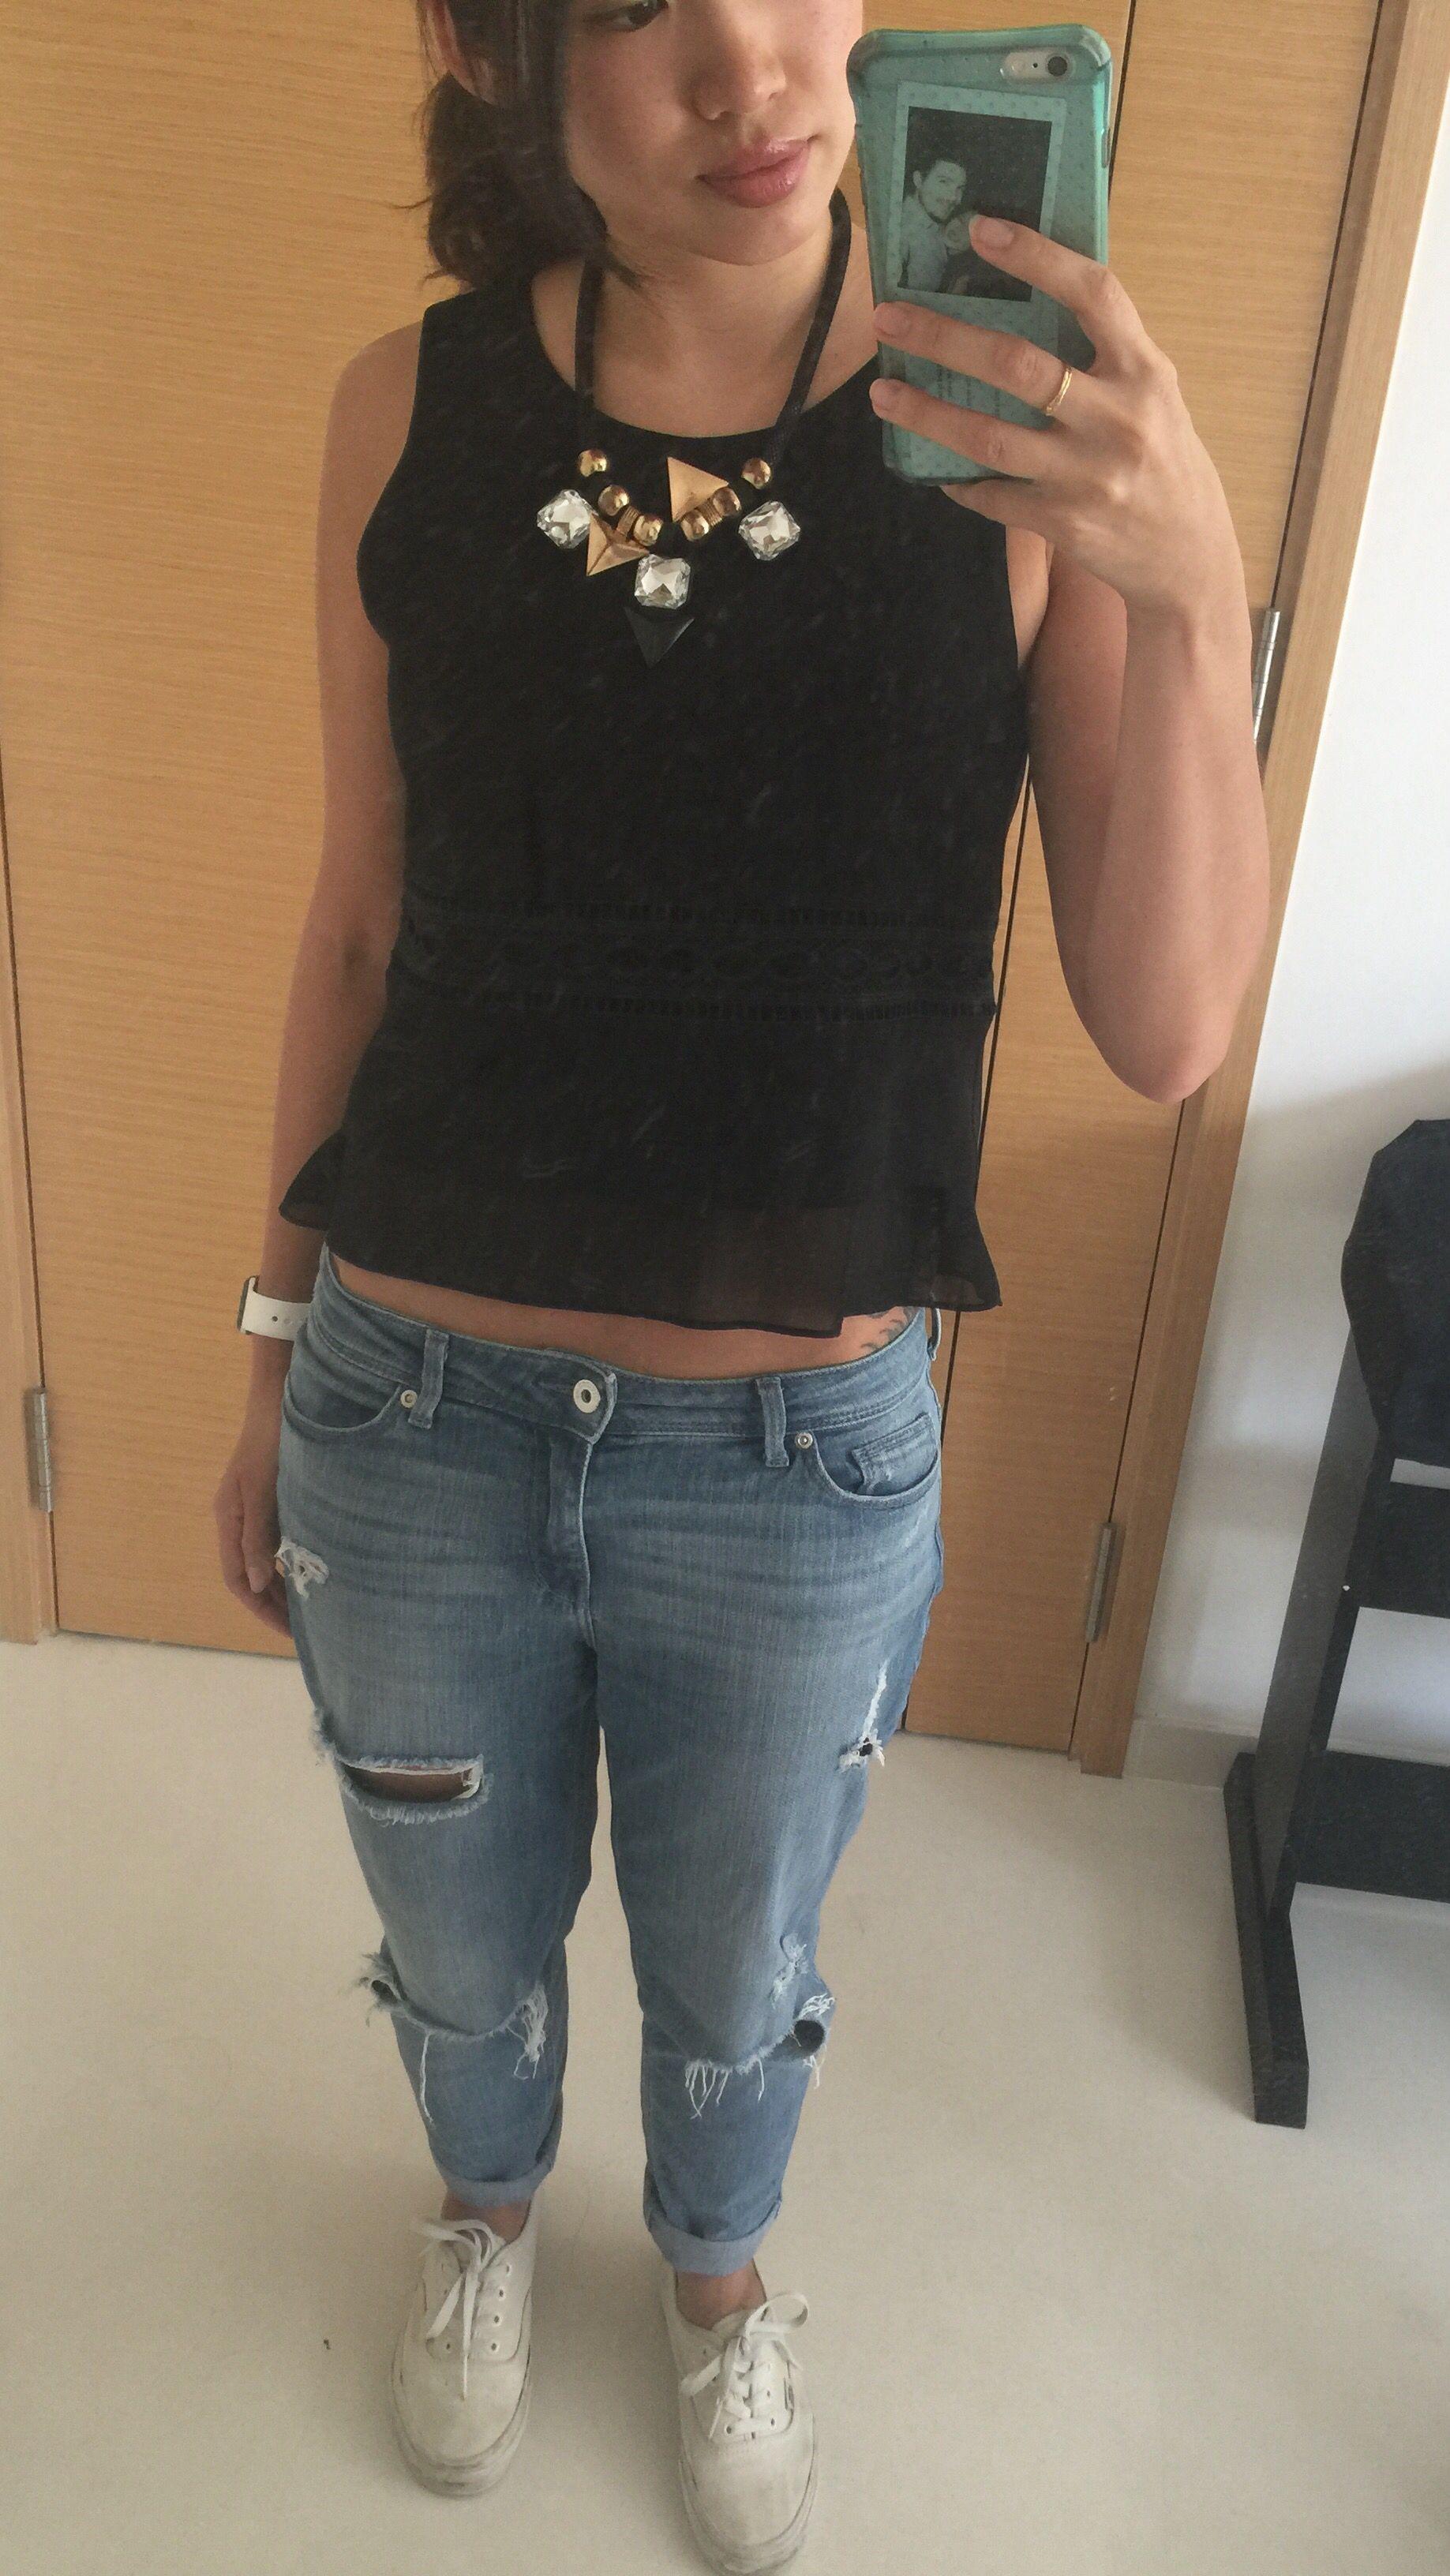 Day 22: Club Monaco top, BF jeans, dirty Vans!